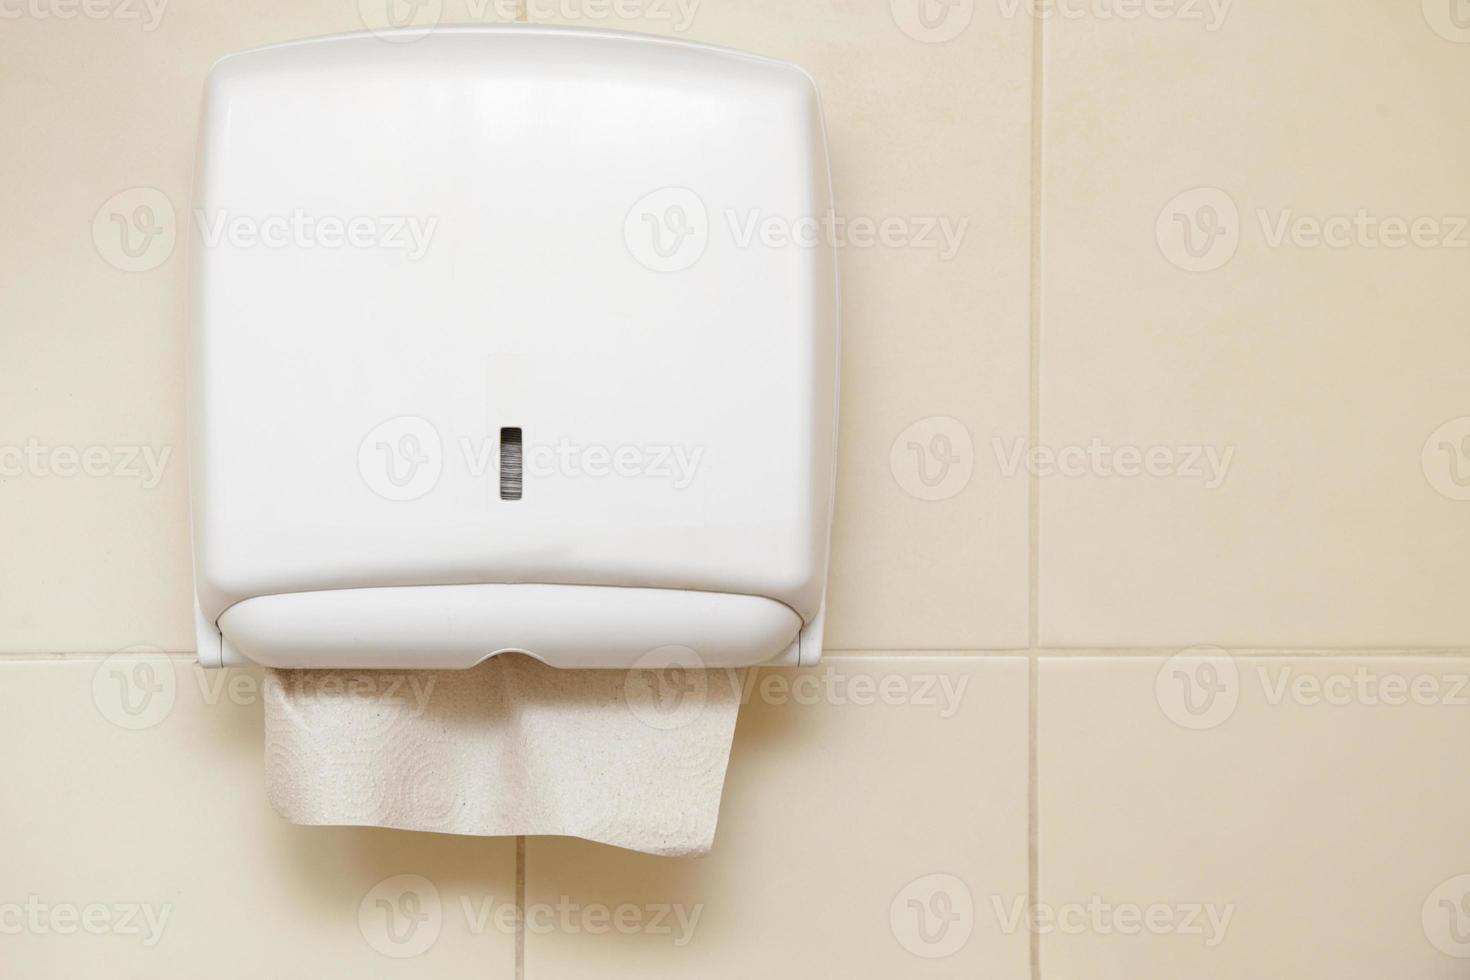 Paper towel dispenser in the bathroom photo